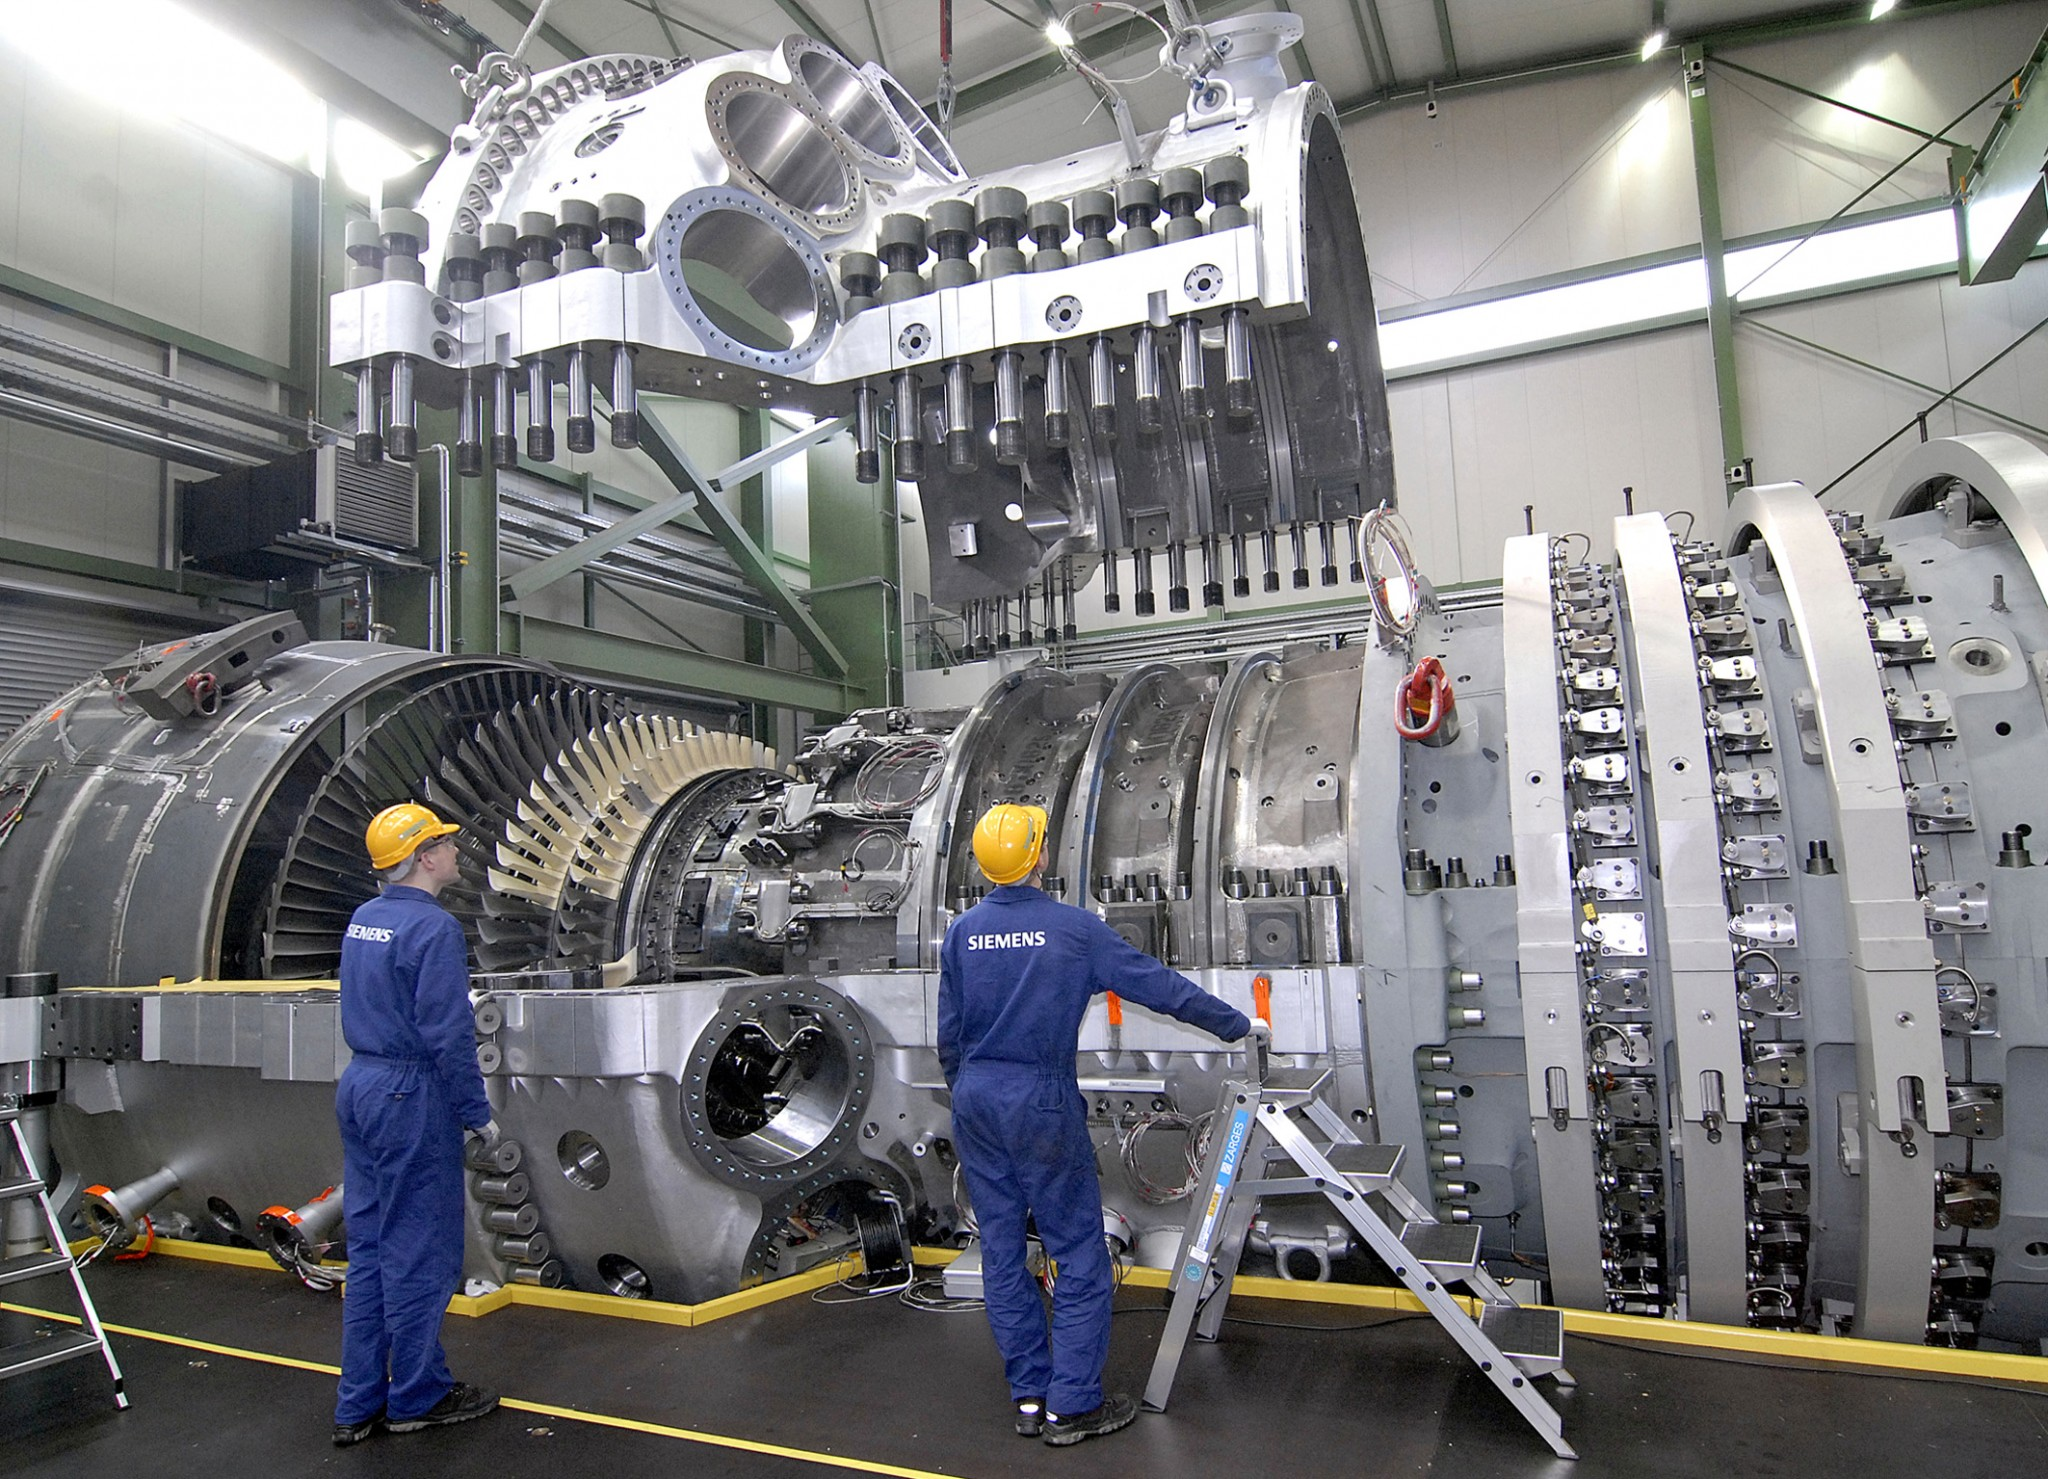 Siemens-turbines-gaz-detournees